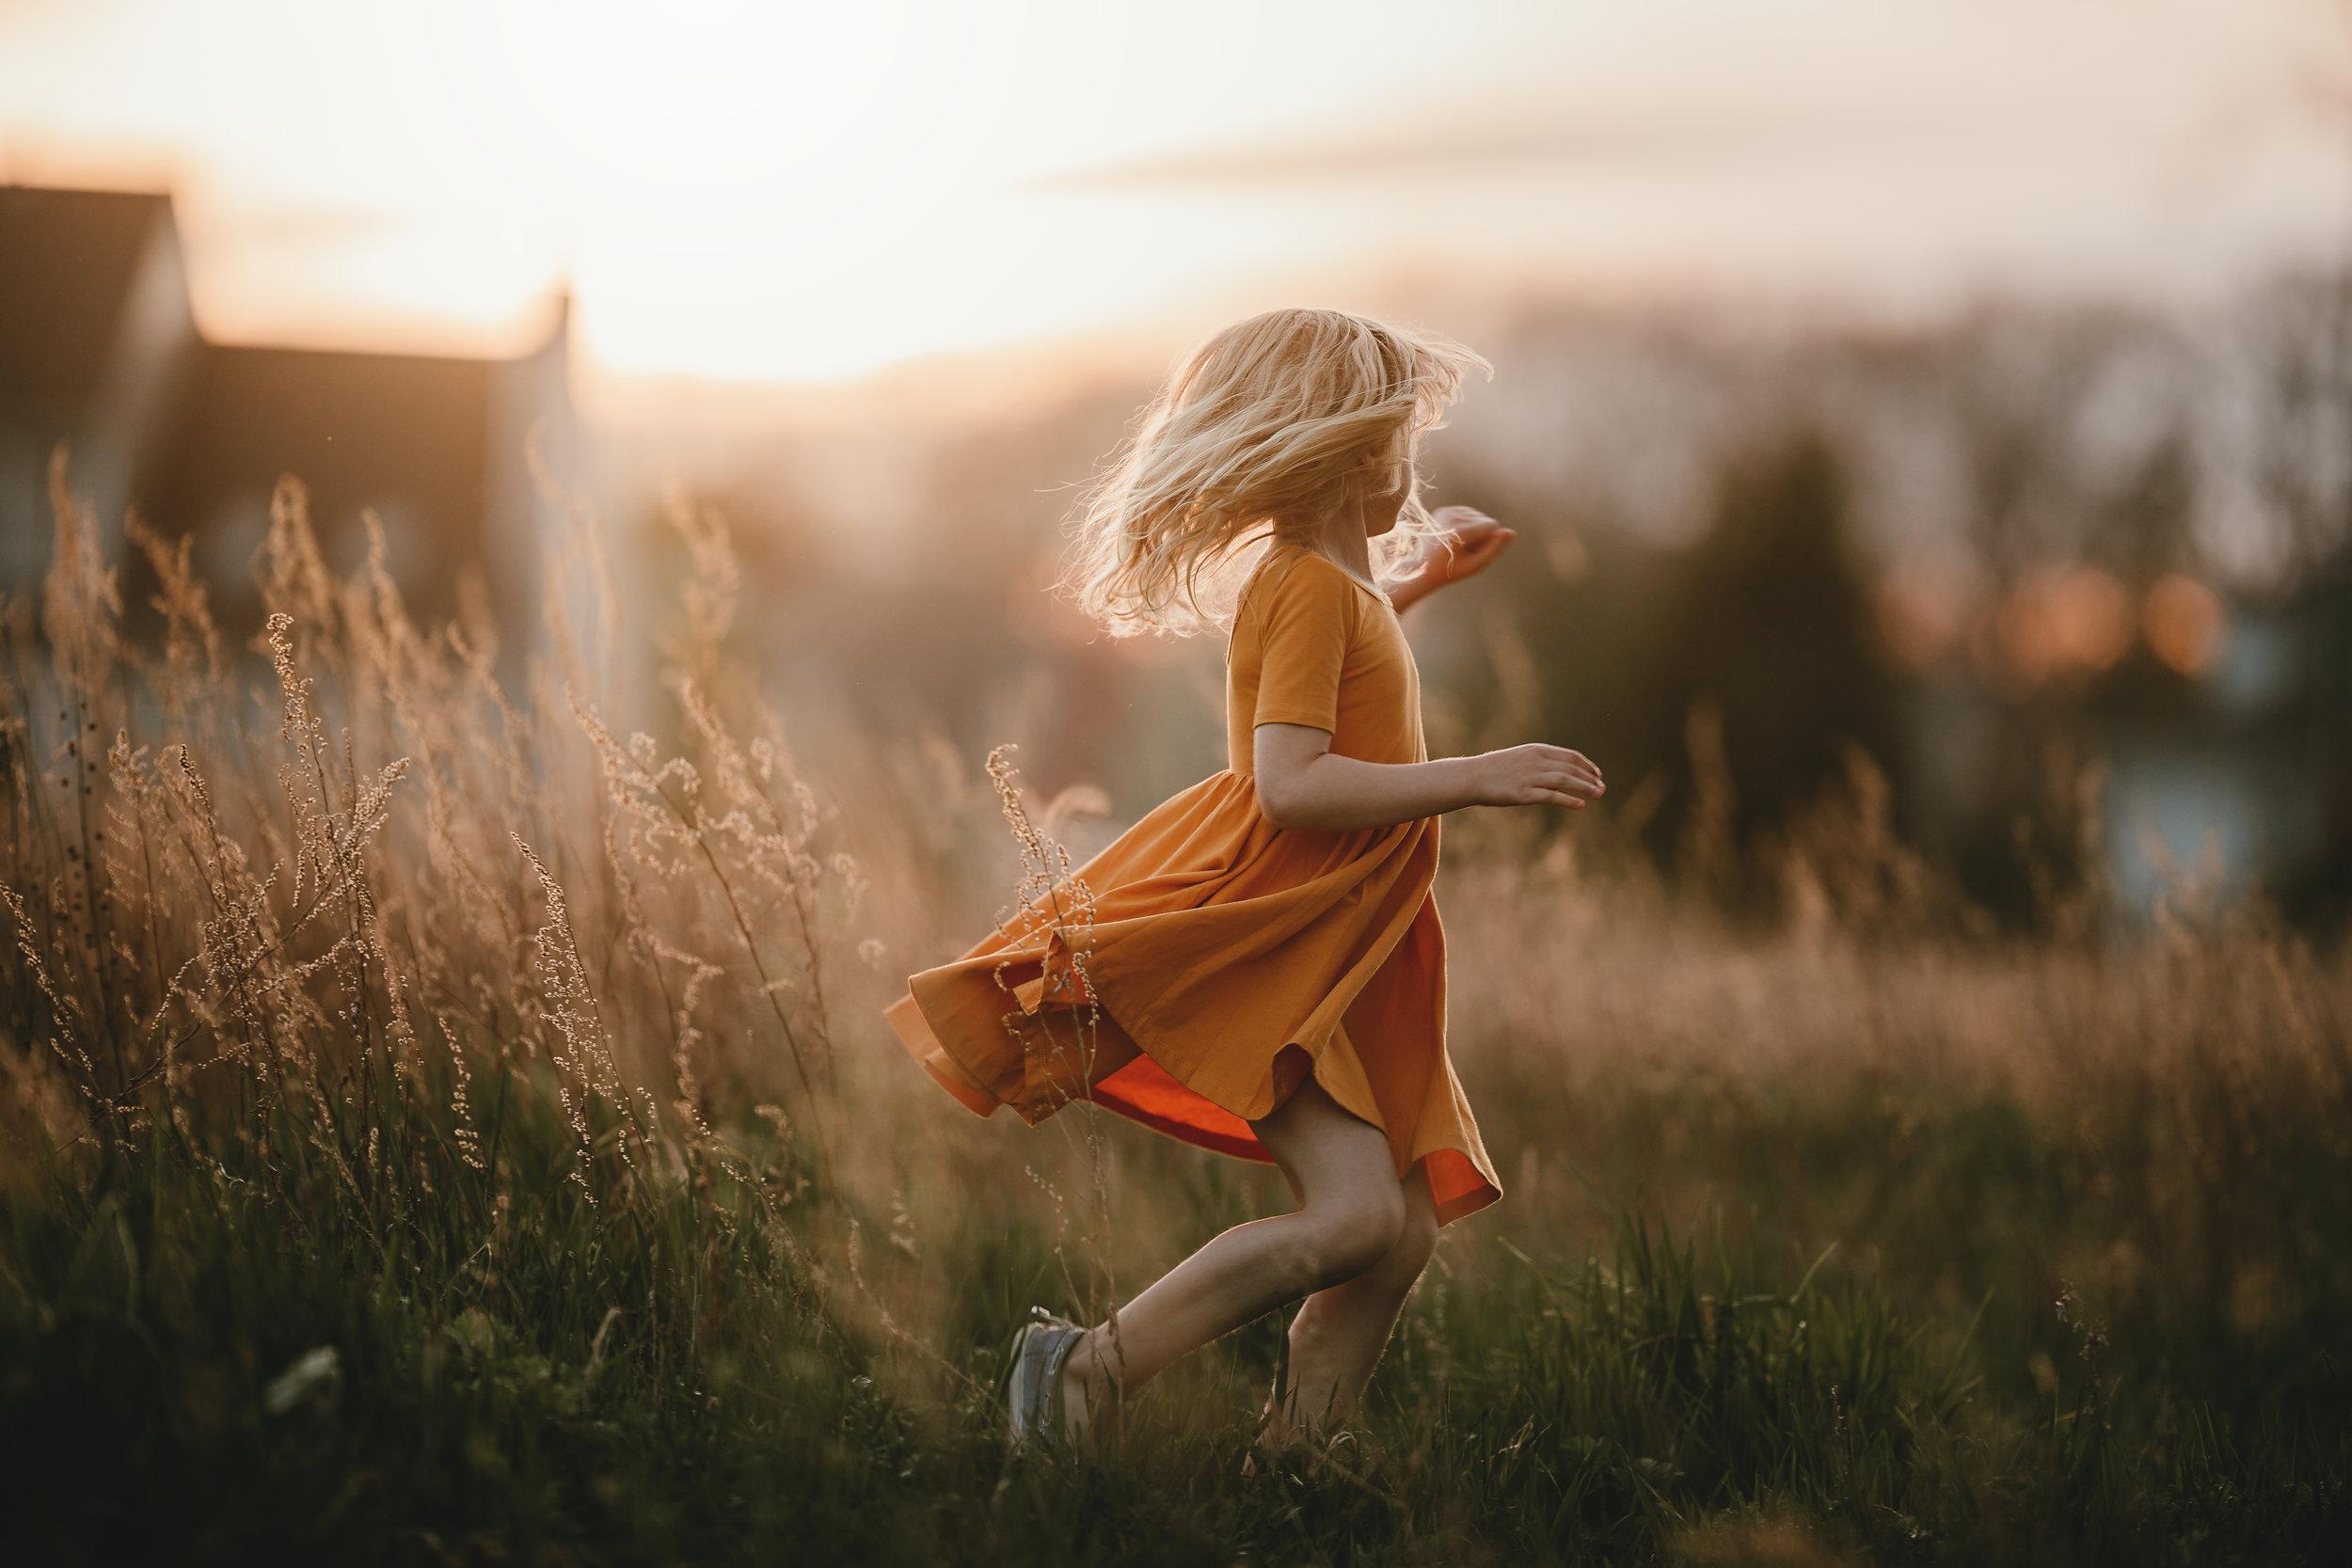 Hello-olivia-photography-long-island-photographer-children-lifestyle-dancing-golden-light.jpg